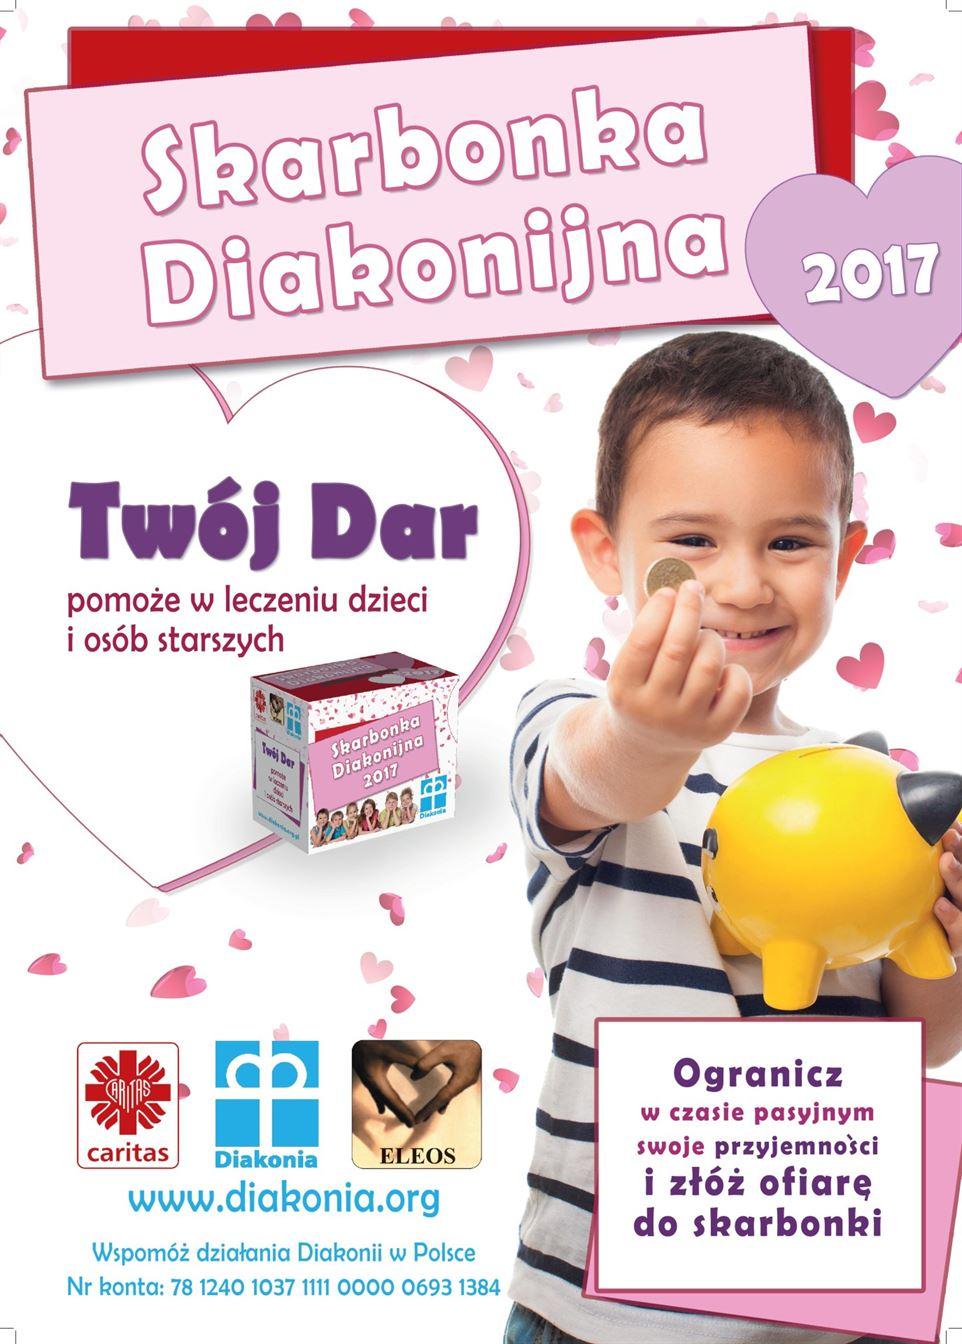 Plakat Skarbonka Diakonijna 2017